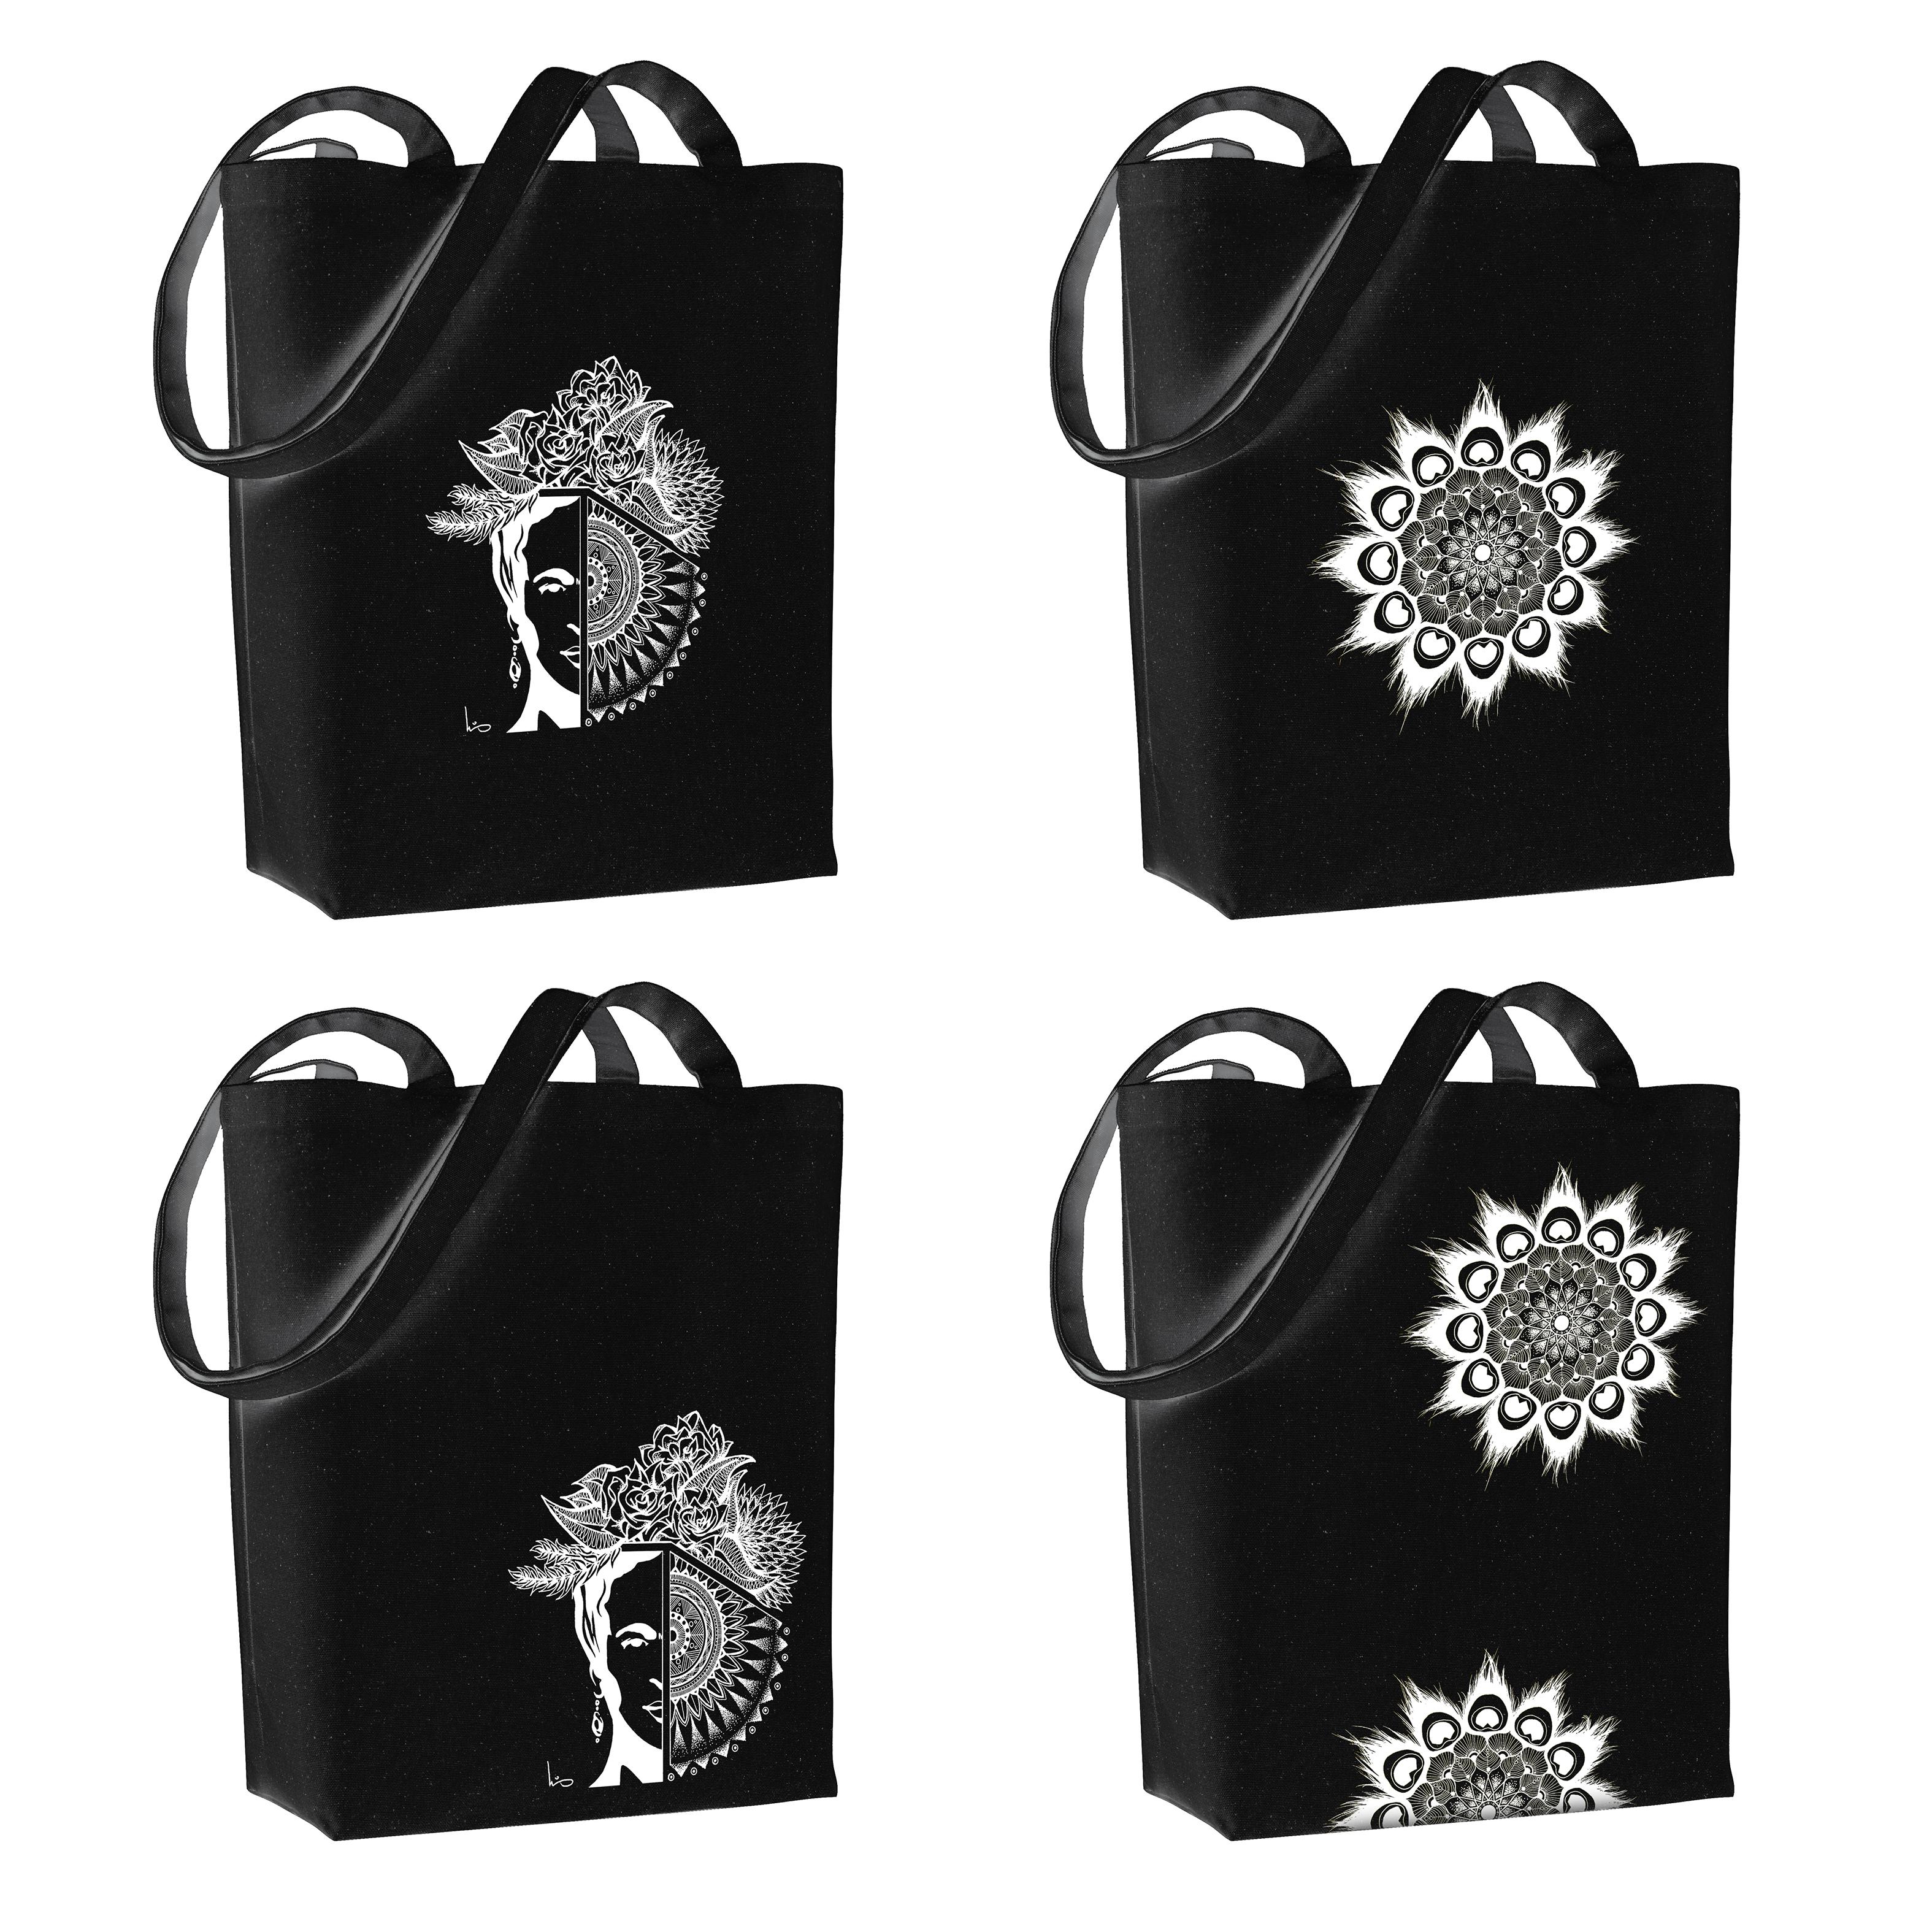 All designs in black